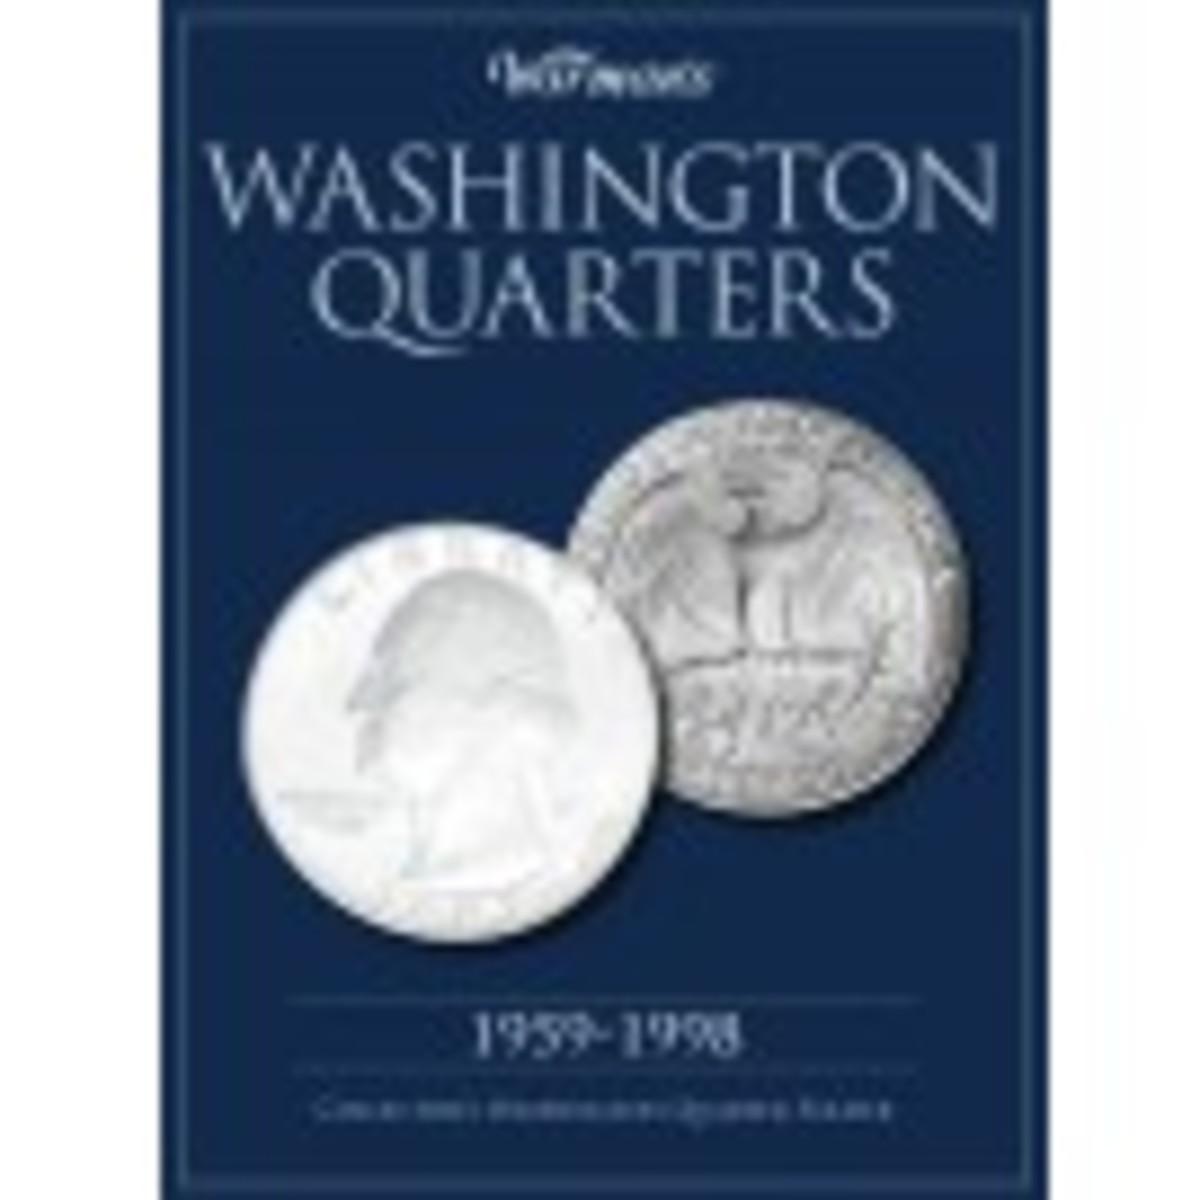 Washington Quarters 1959-1998 Collector's Folder